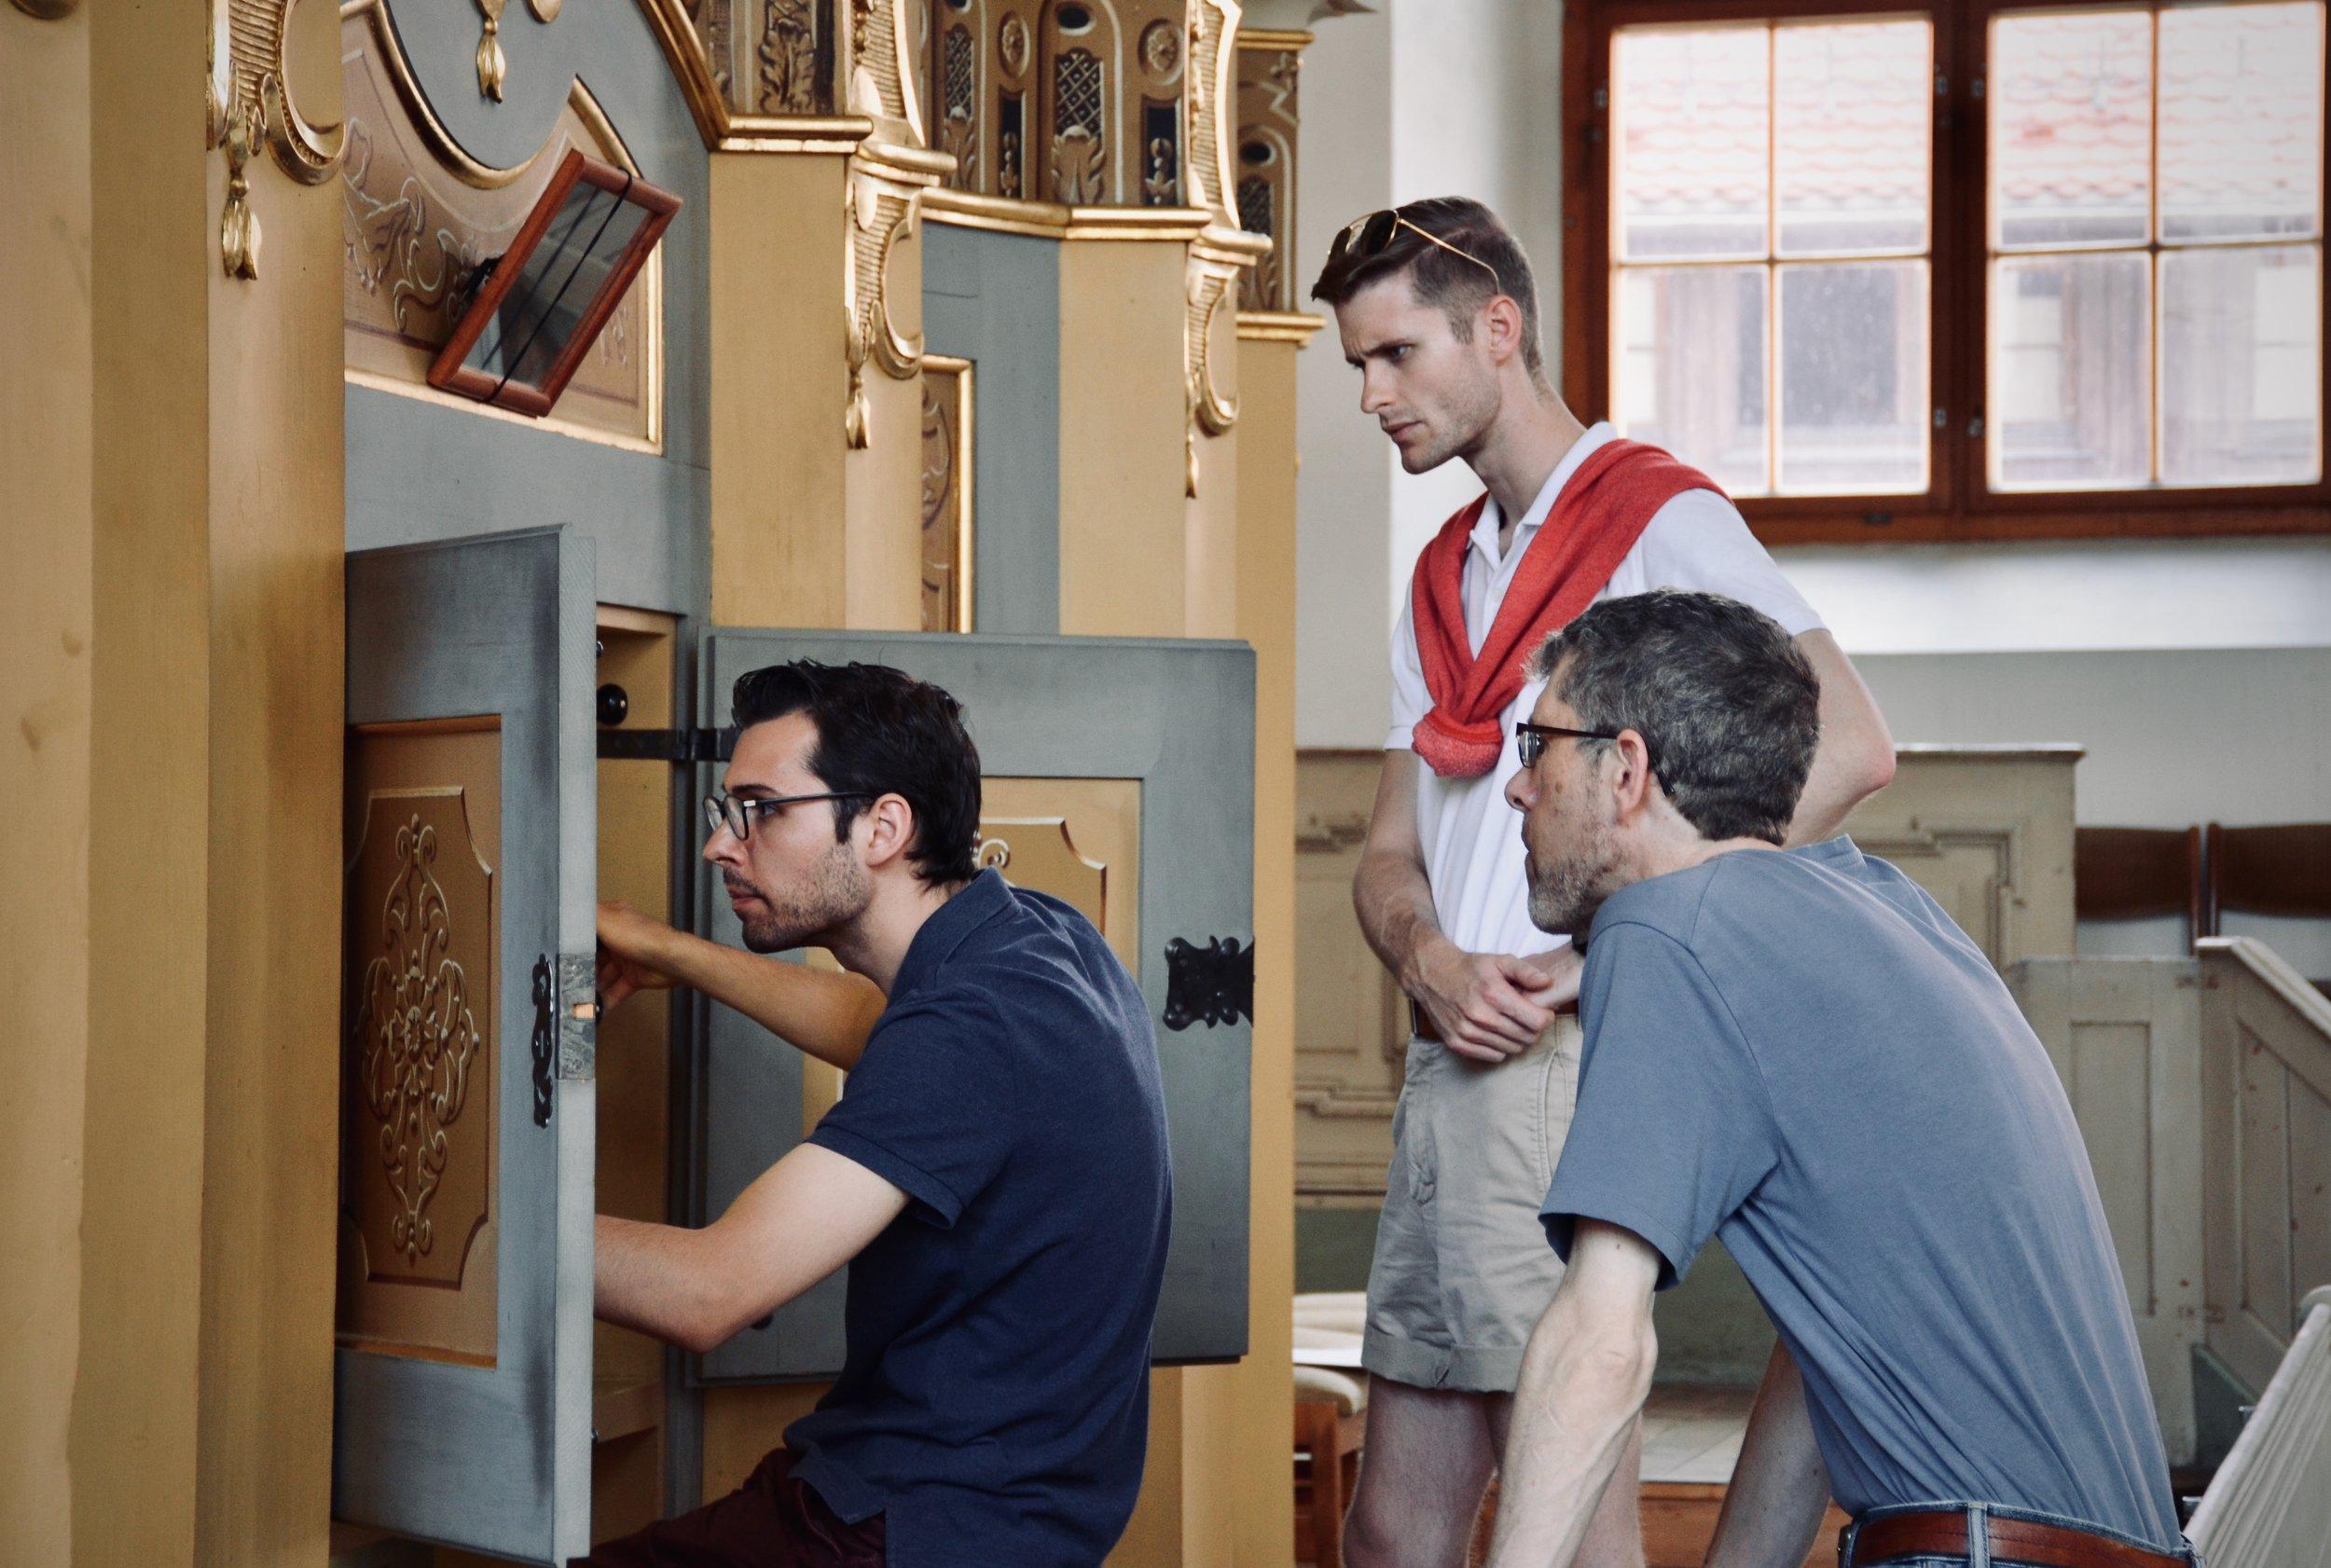 Nick Capozzoli plays the 1735 Gottfried Silbermann organ, St. Petrikirche, Freiberg.